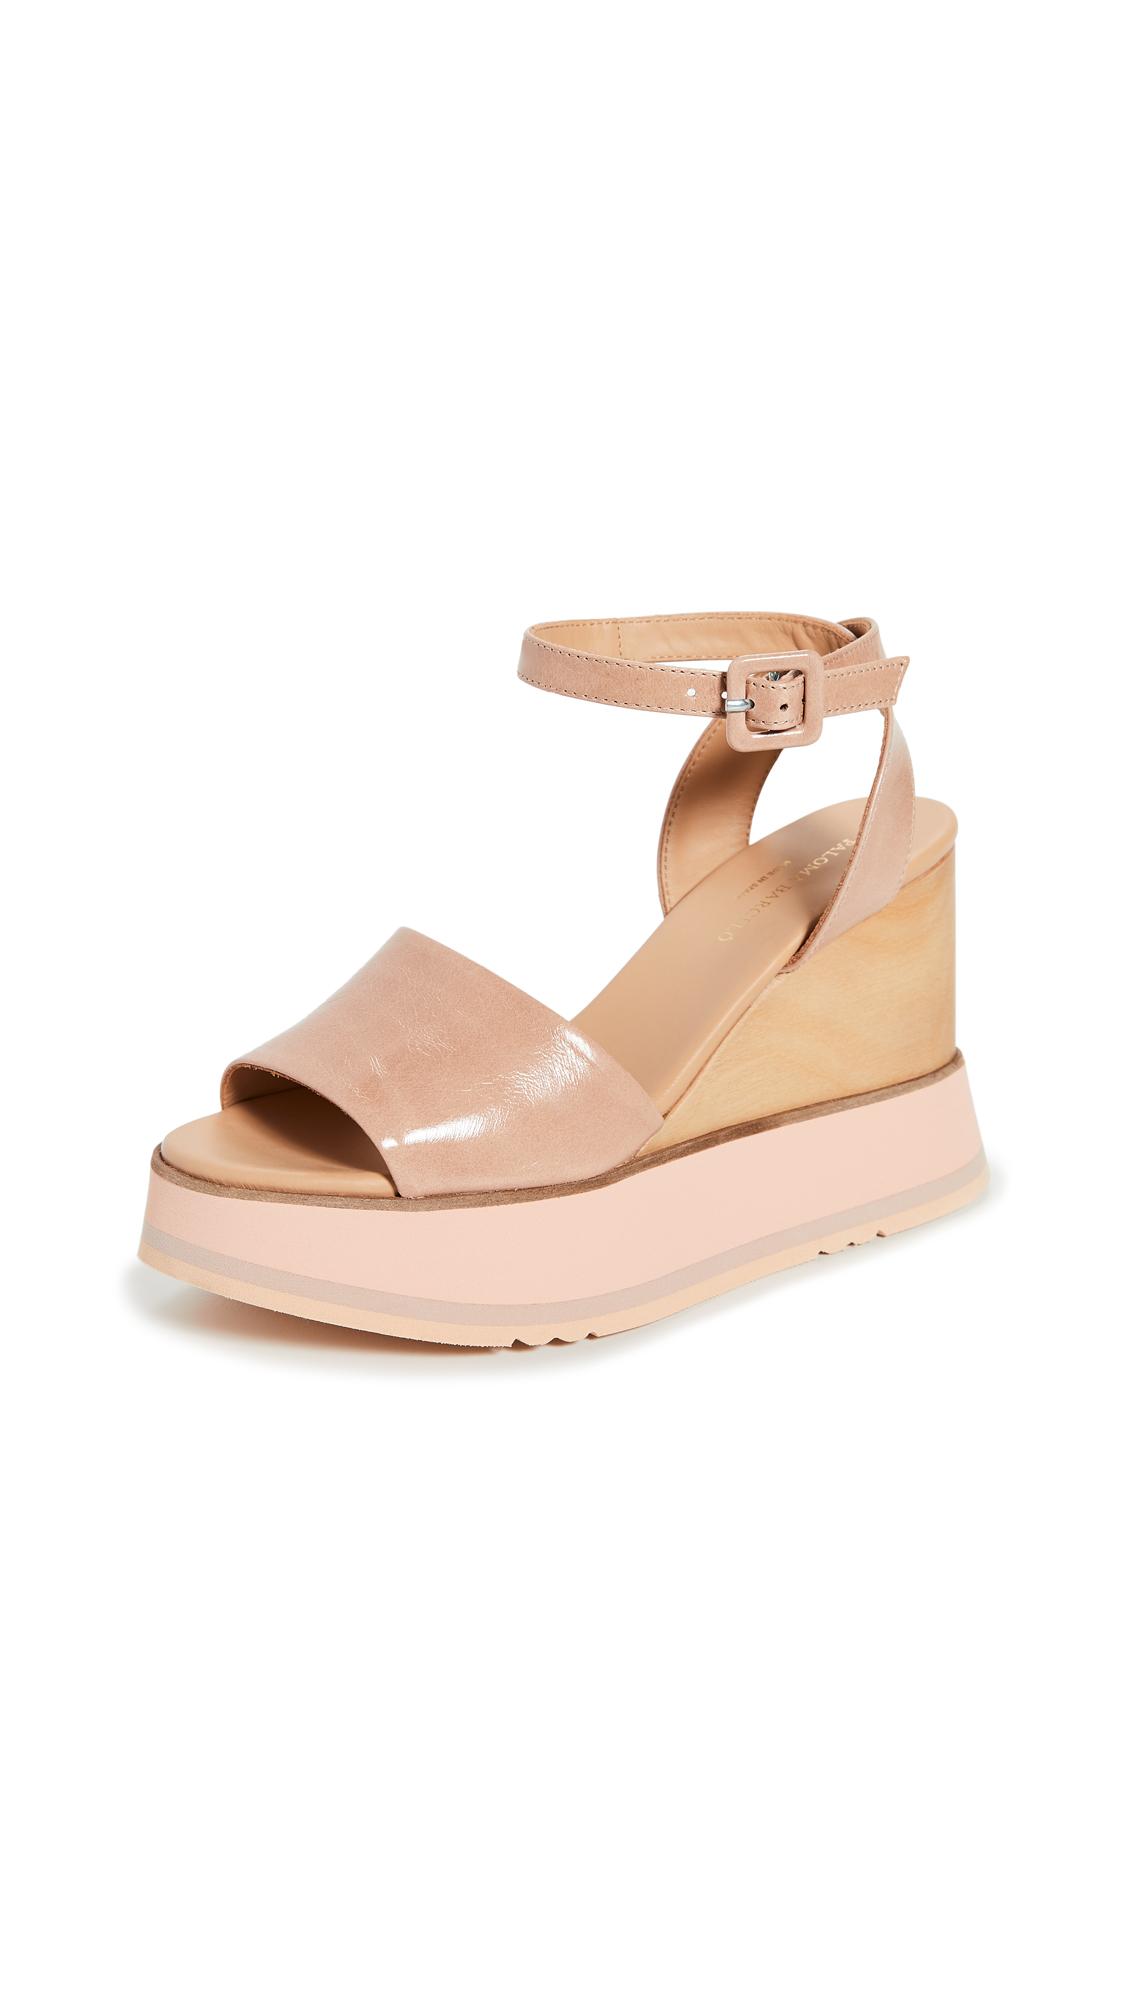 Buy Paloma Barcelo Gisele Wedge Sandals online, shop Paloma Barcelo